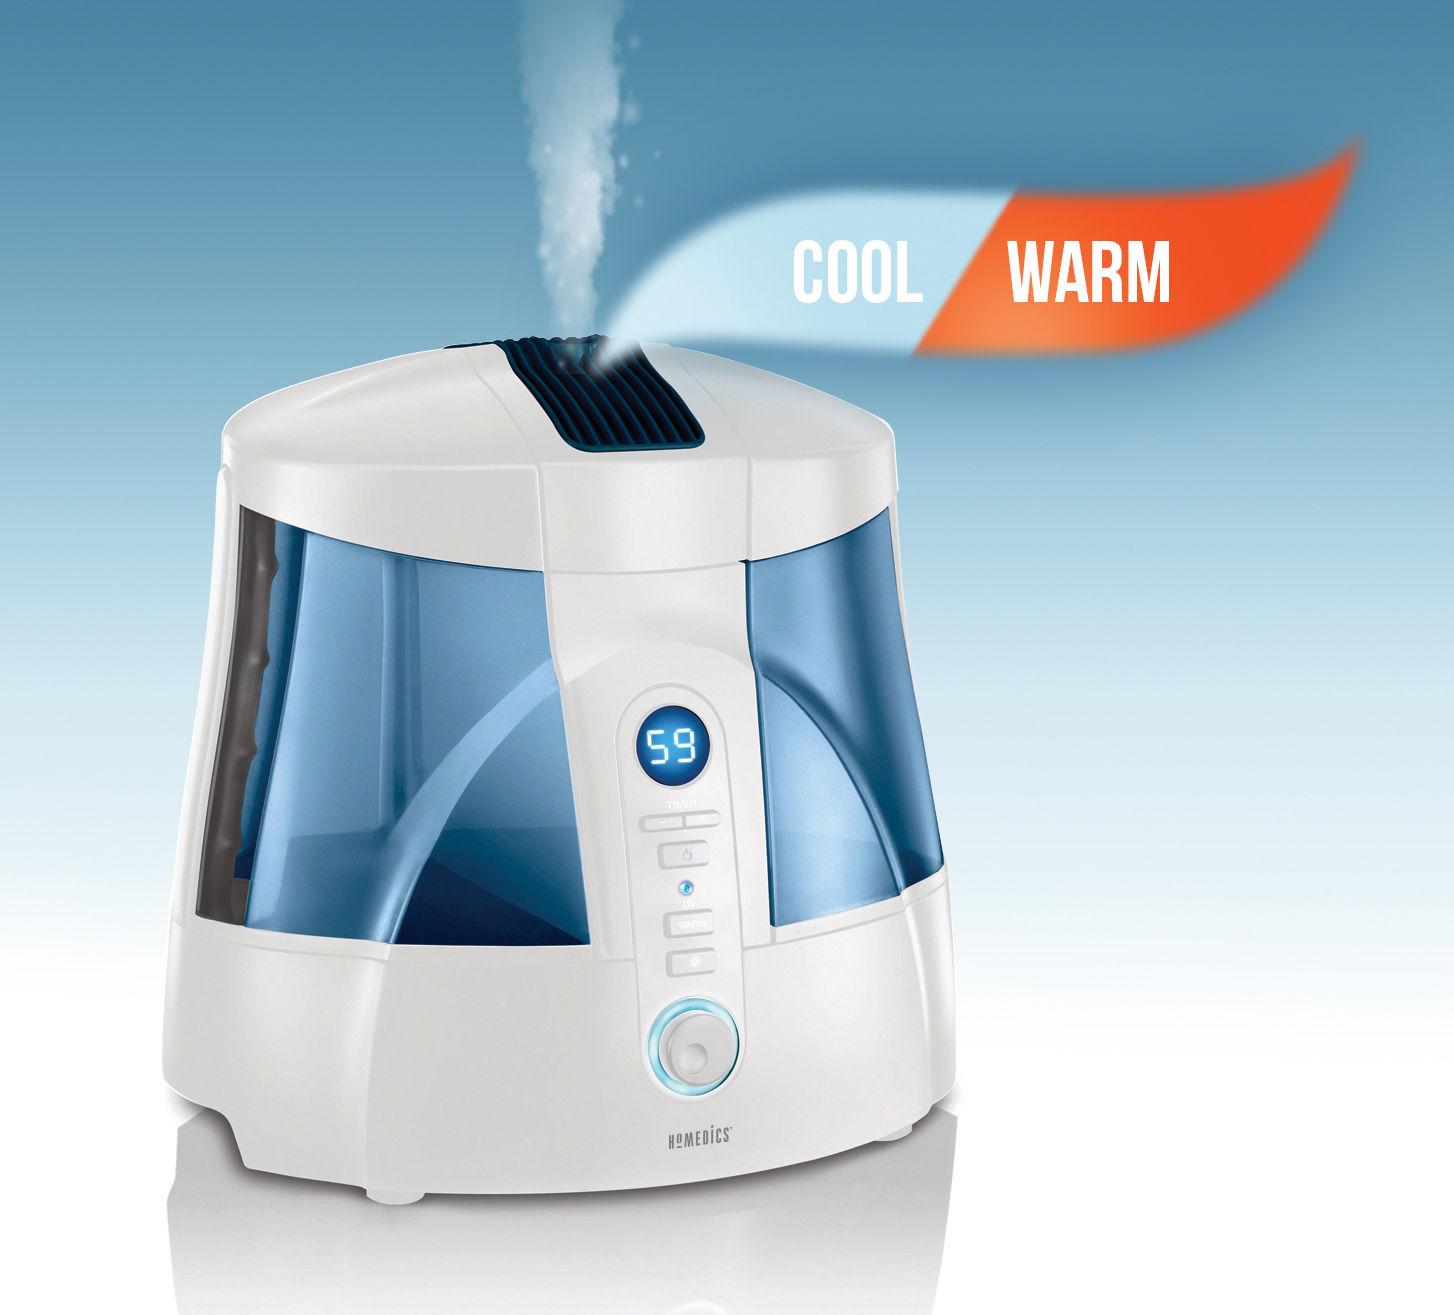 Homedics Cool U0026 Warm Mist Ultrasonic Humidifier Hum Manual Guide